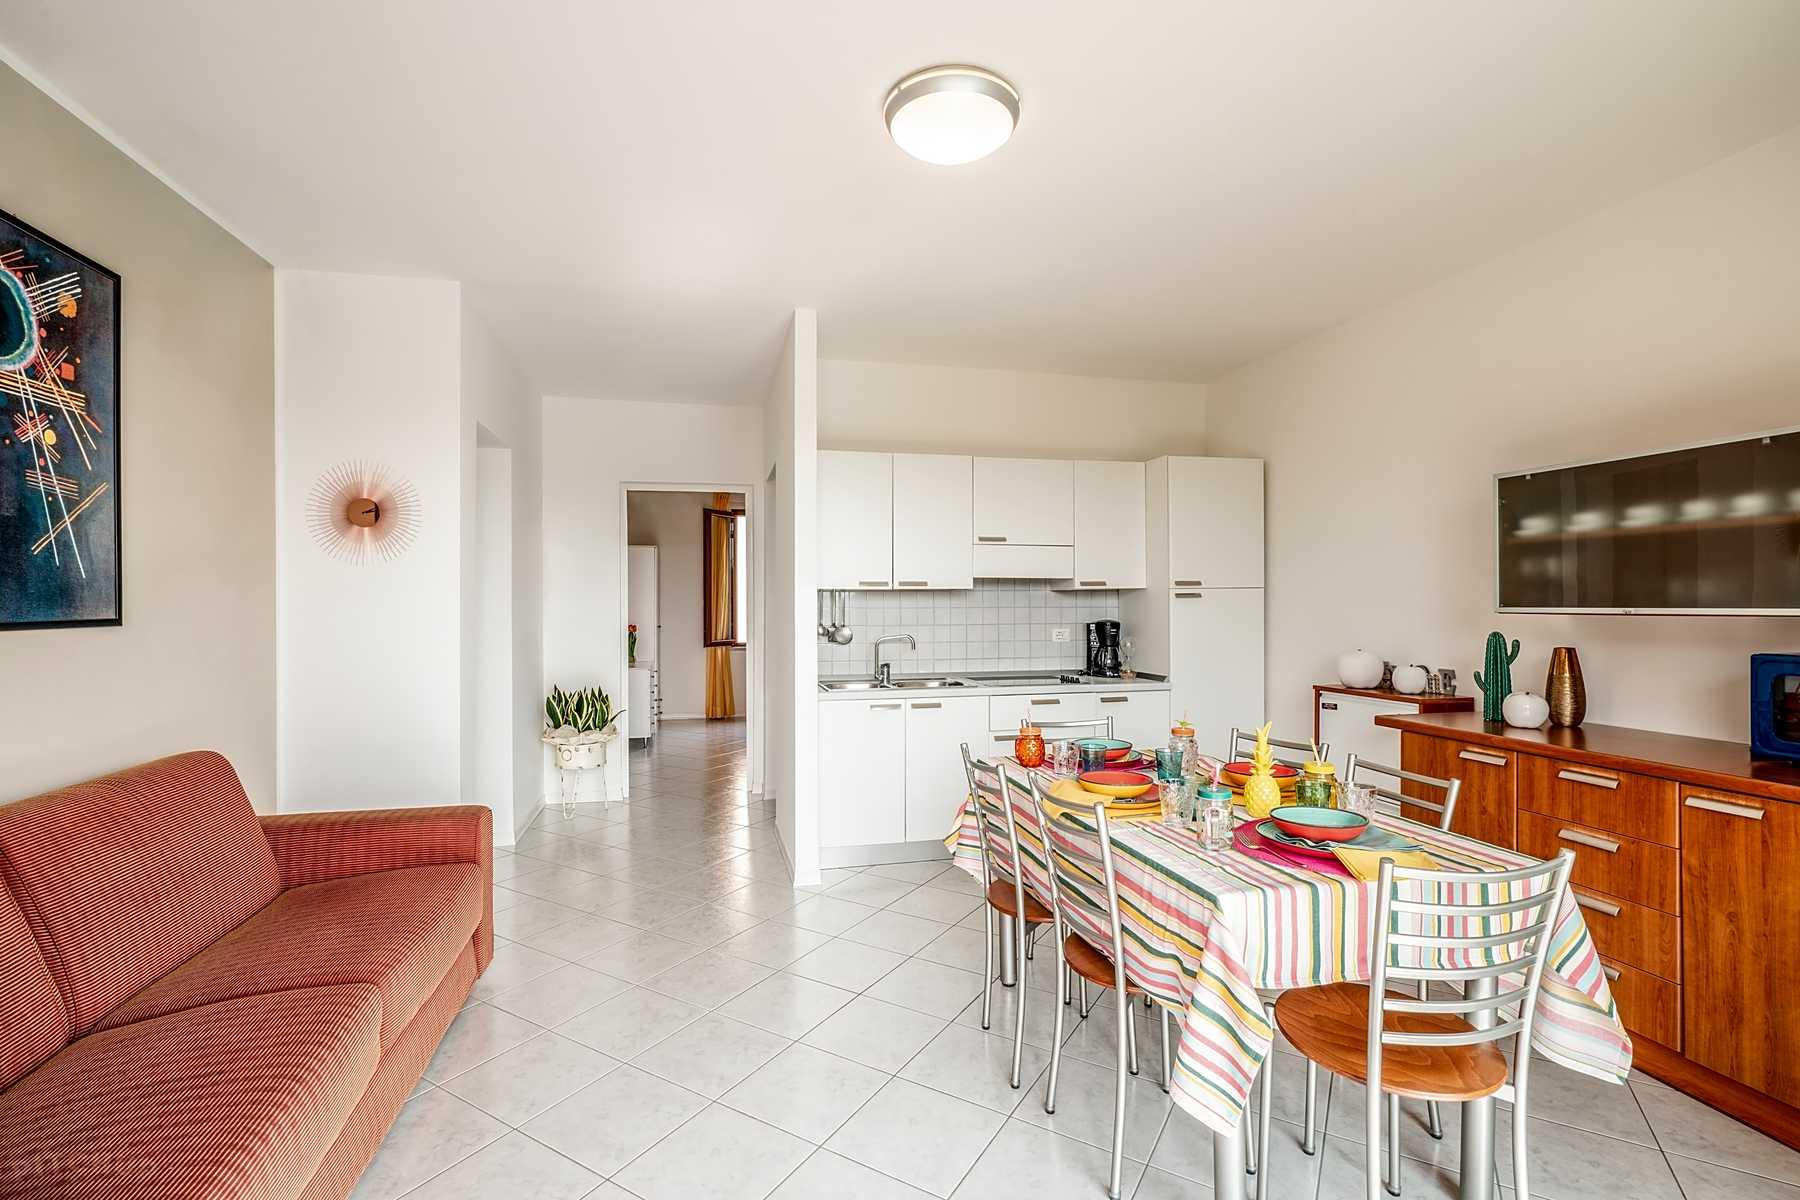 Cucine Low Cost Brescia residence onda blu, manerba del garda - updated 2020 prices